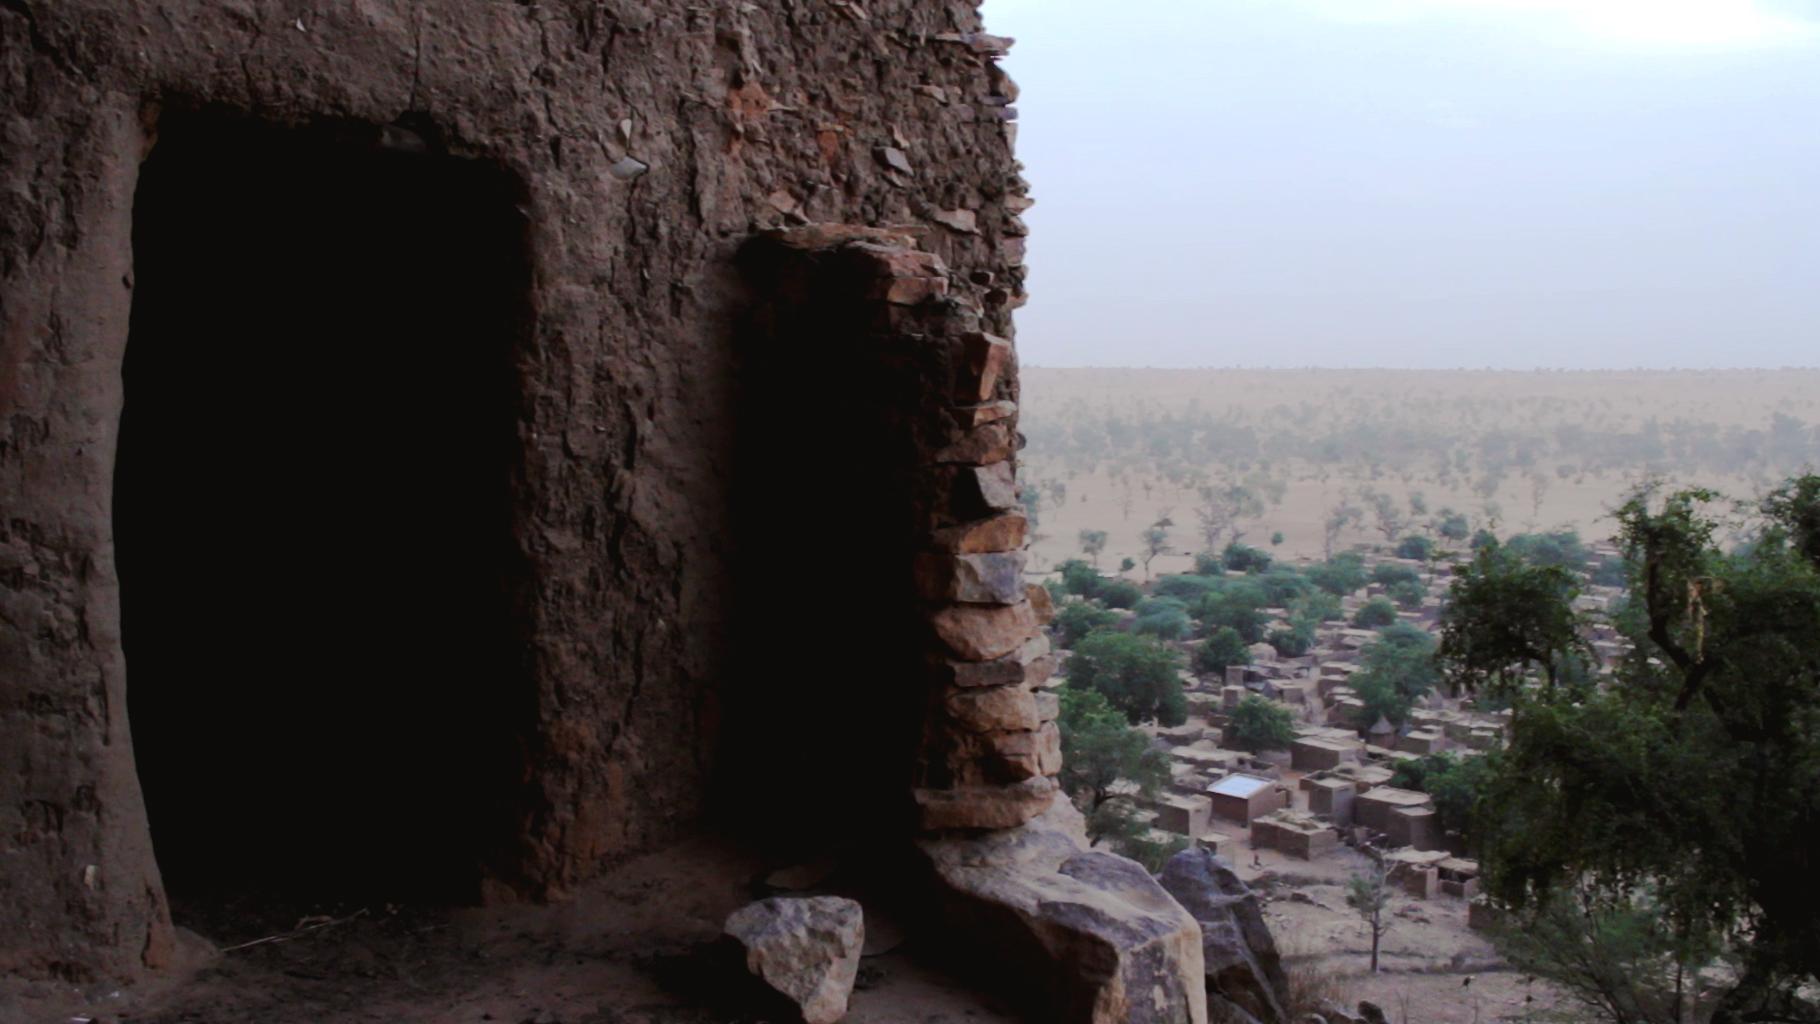 puerta dogon telem pablocaminante - Malí 7, País Dogon IV: Tellem